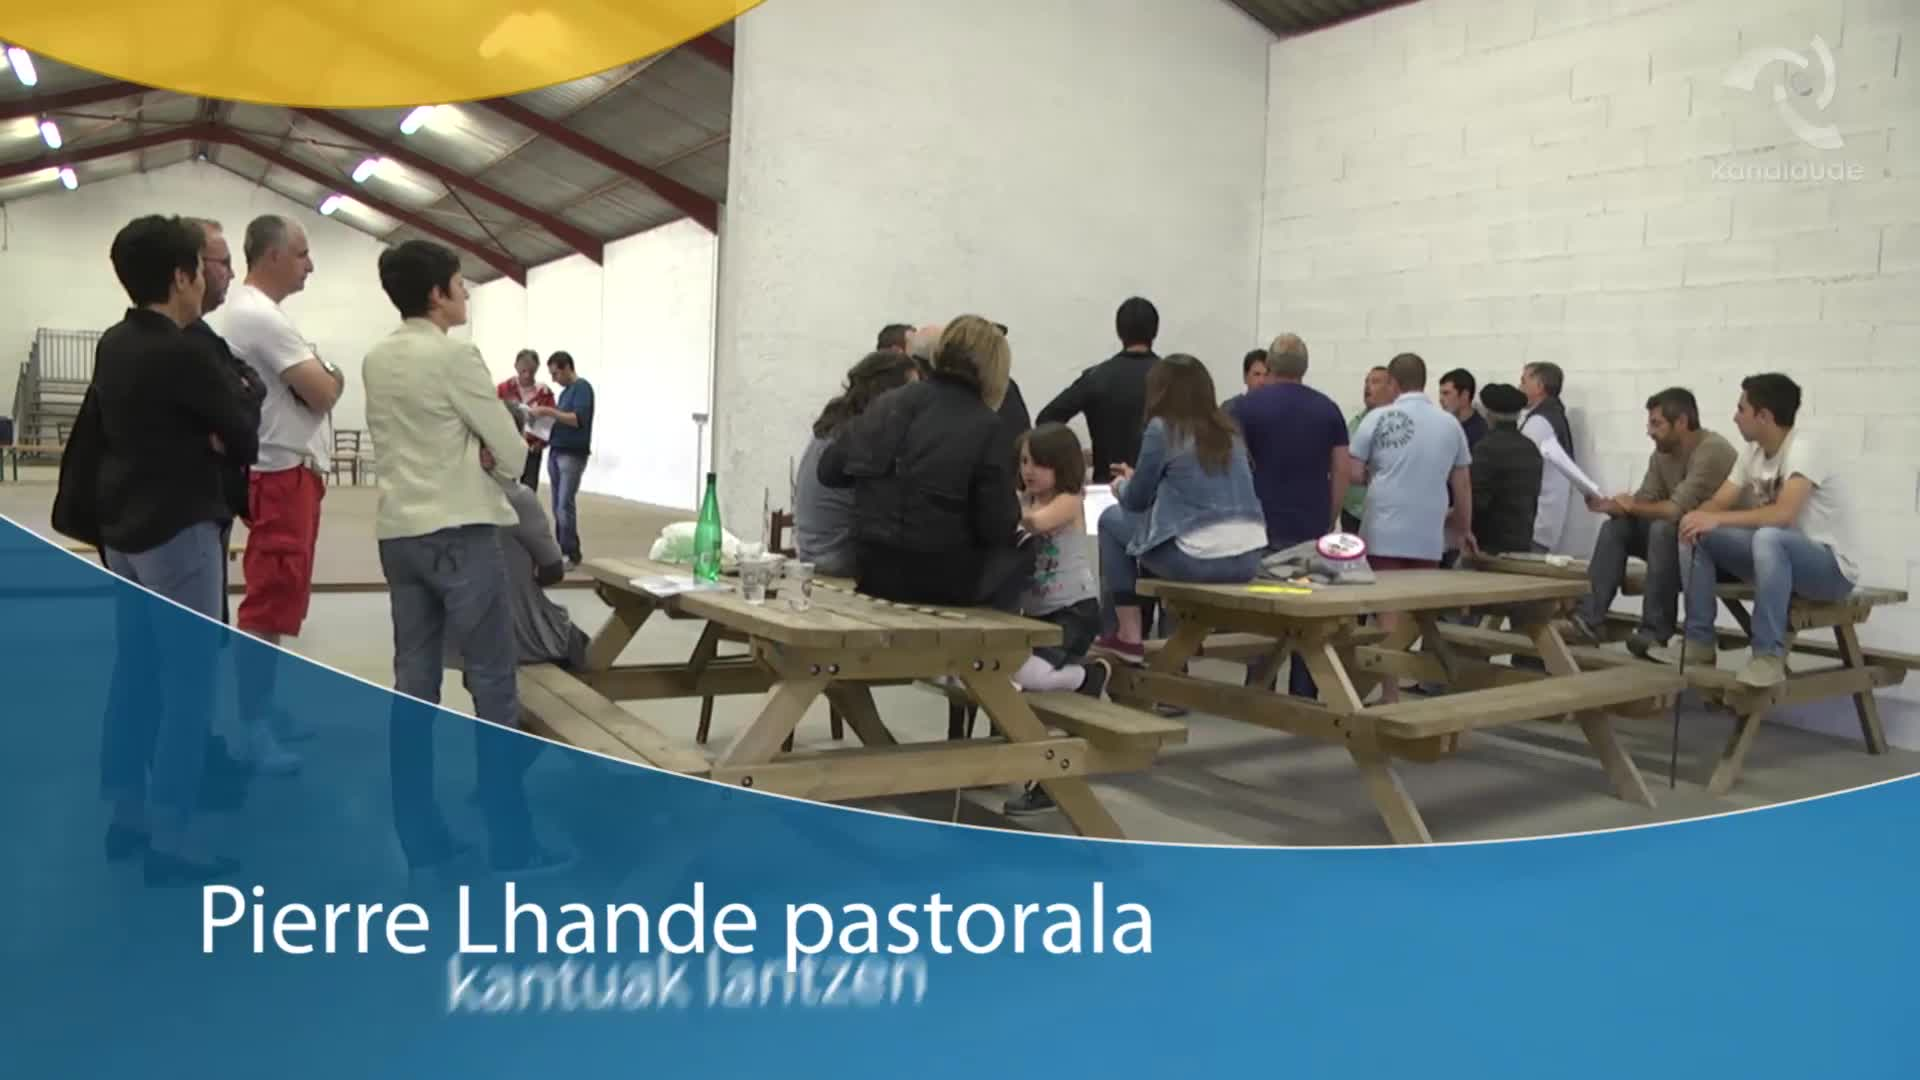 Pierre Lhande pastorala, kantuak lantzen